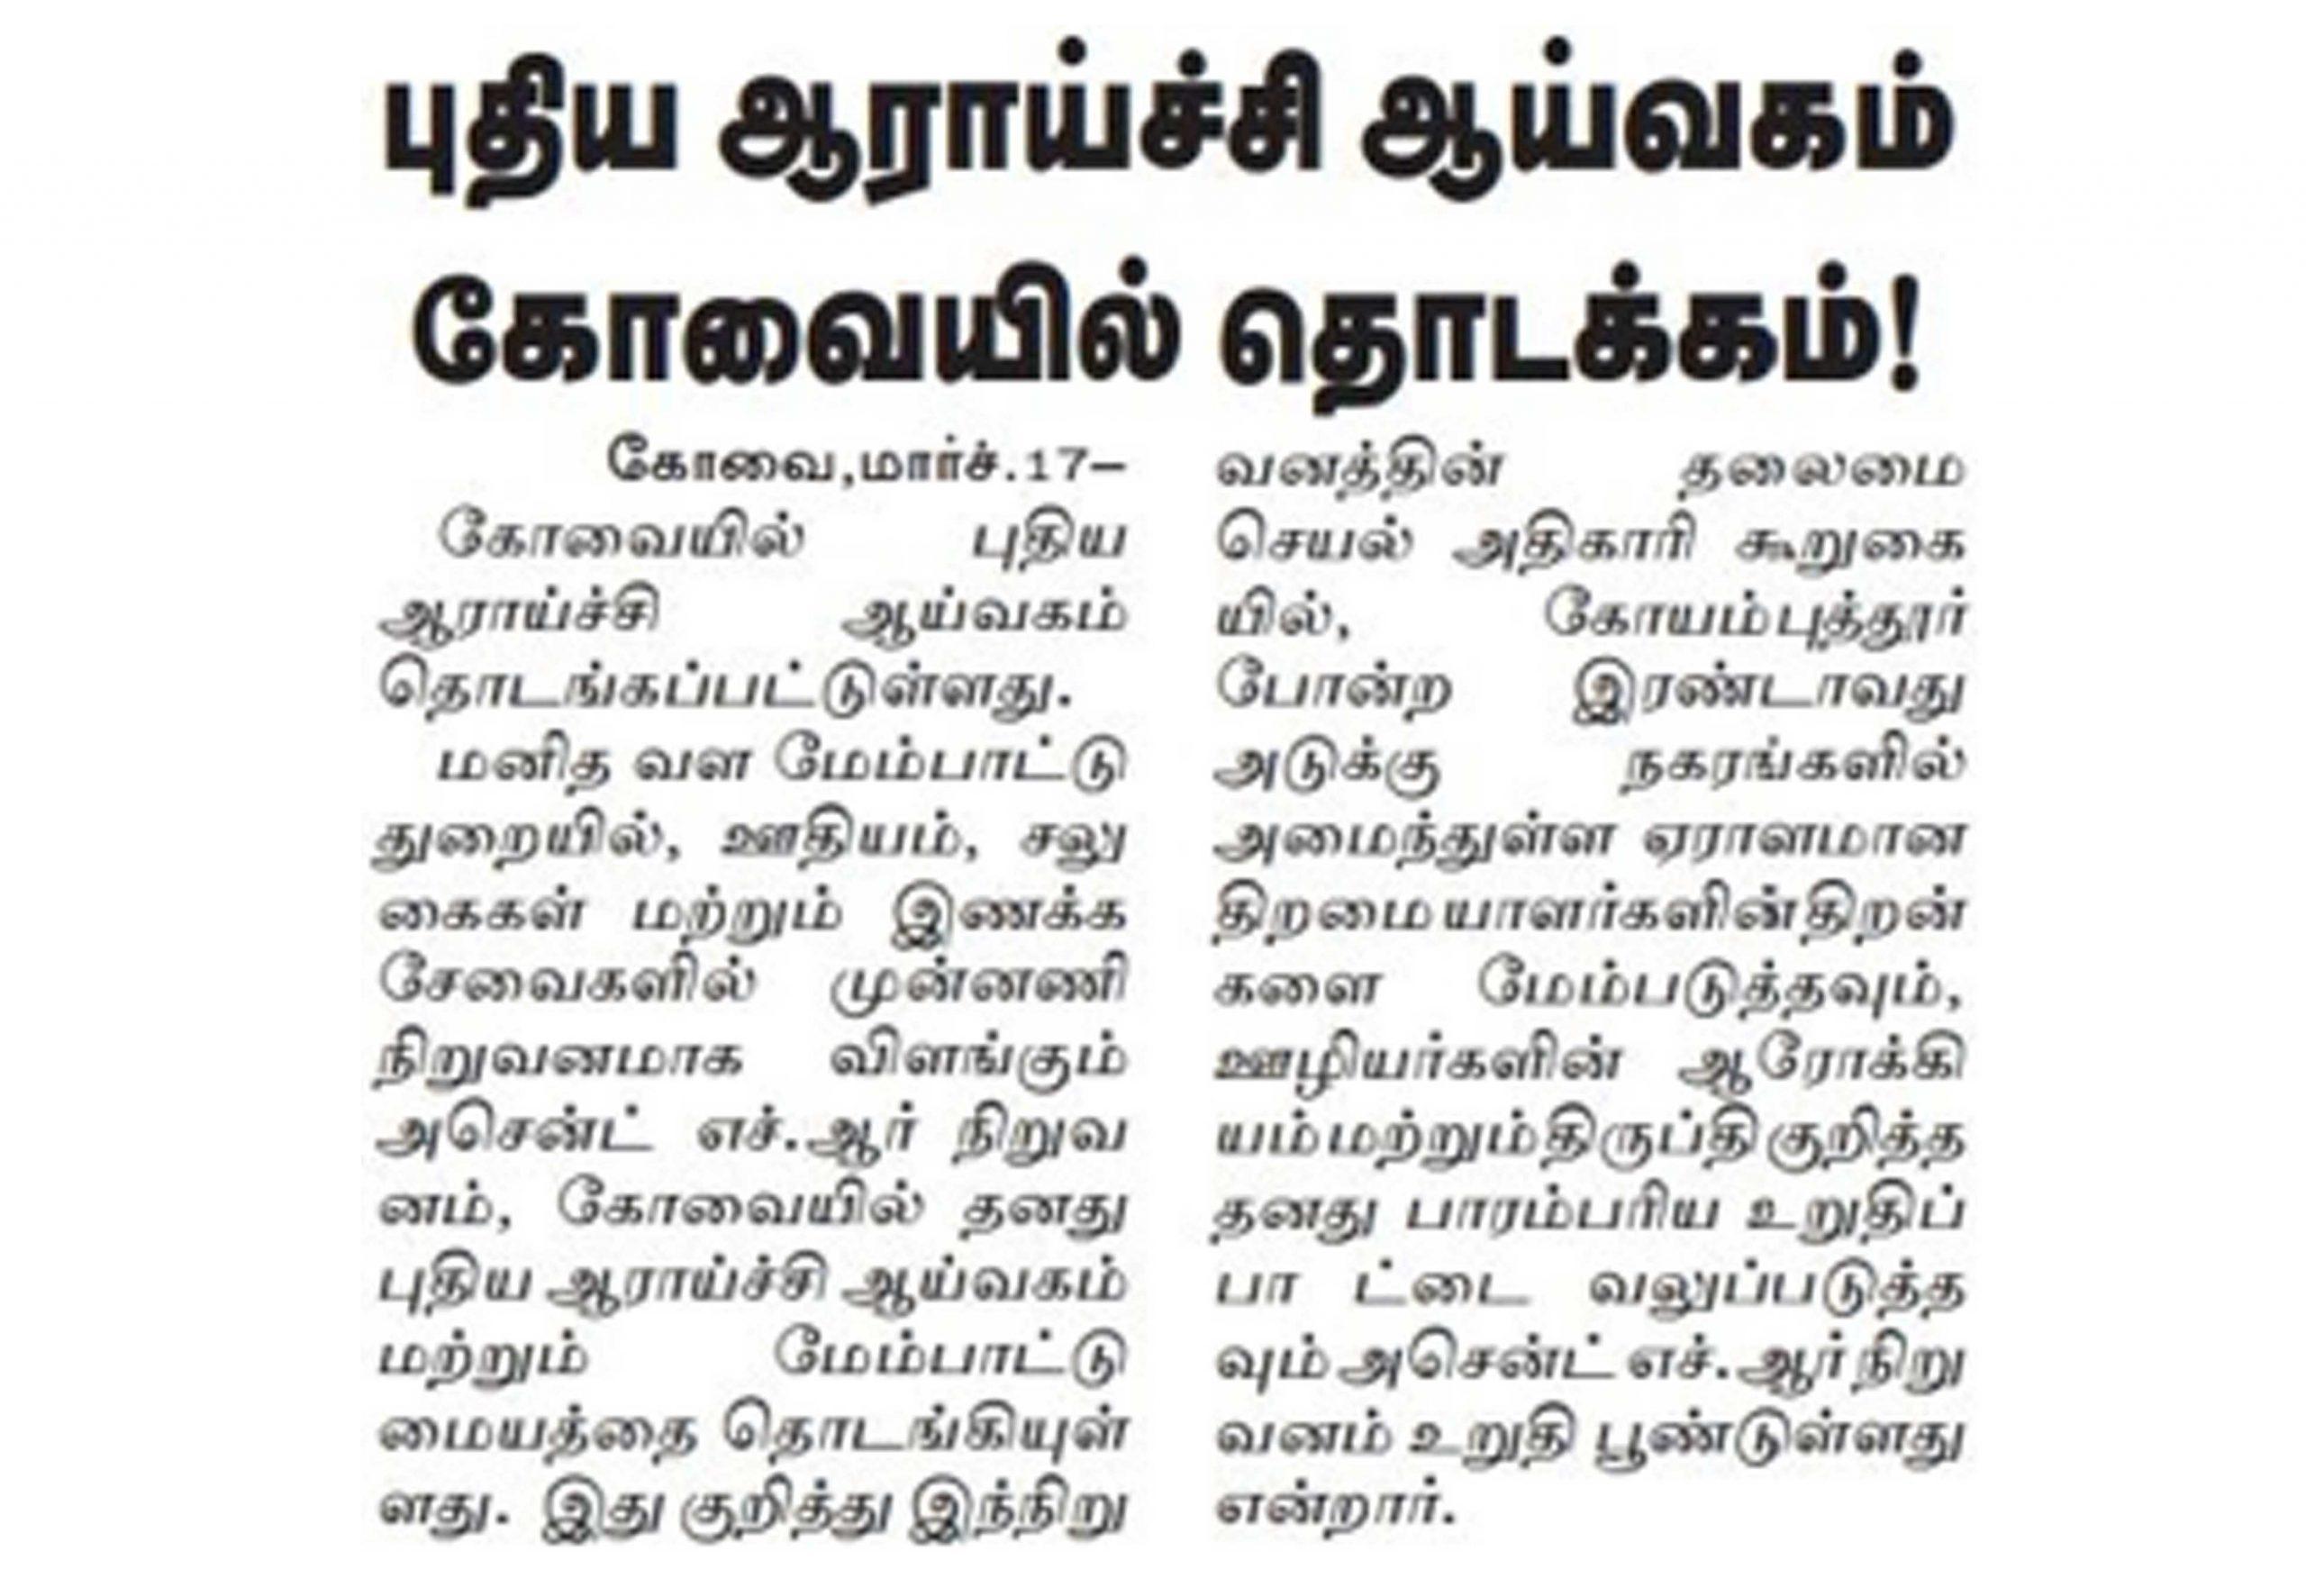 article published in Malai Marasu